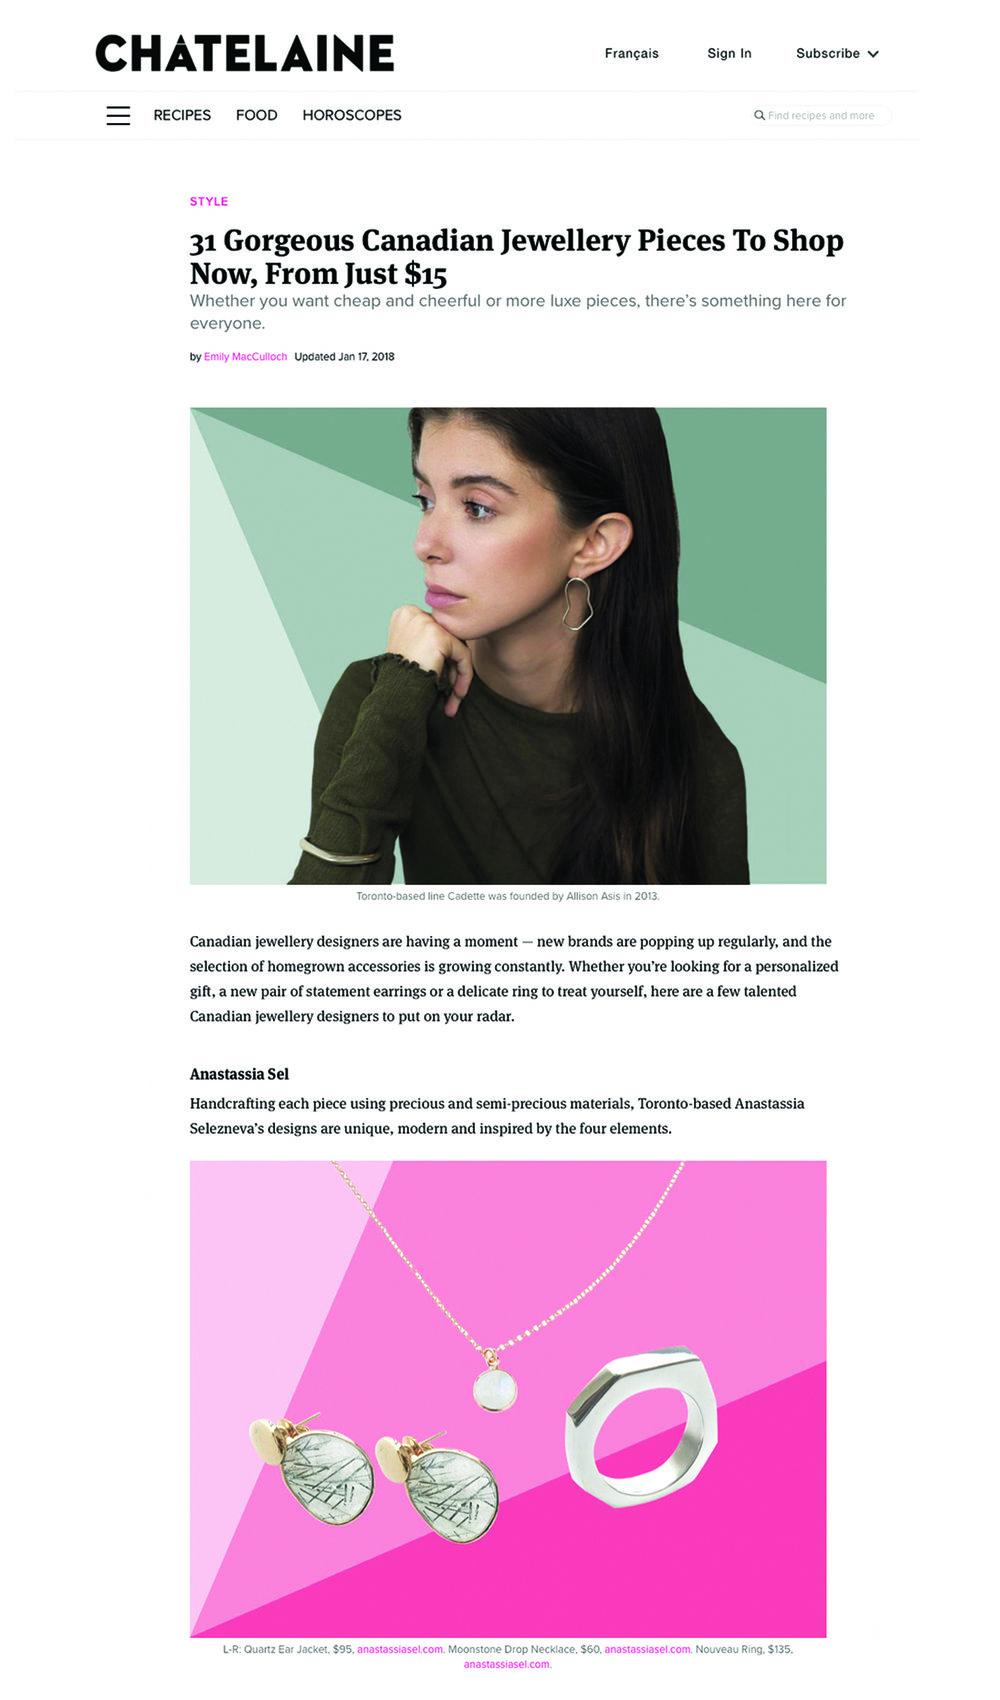 Anastassia Selezneva - Anastassia Sel Jewelry - Chatelaine Magazine.jpg